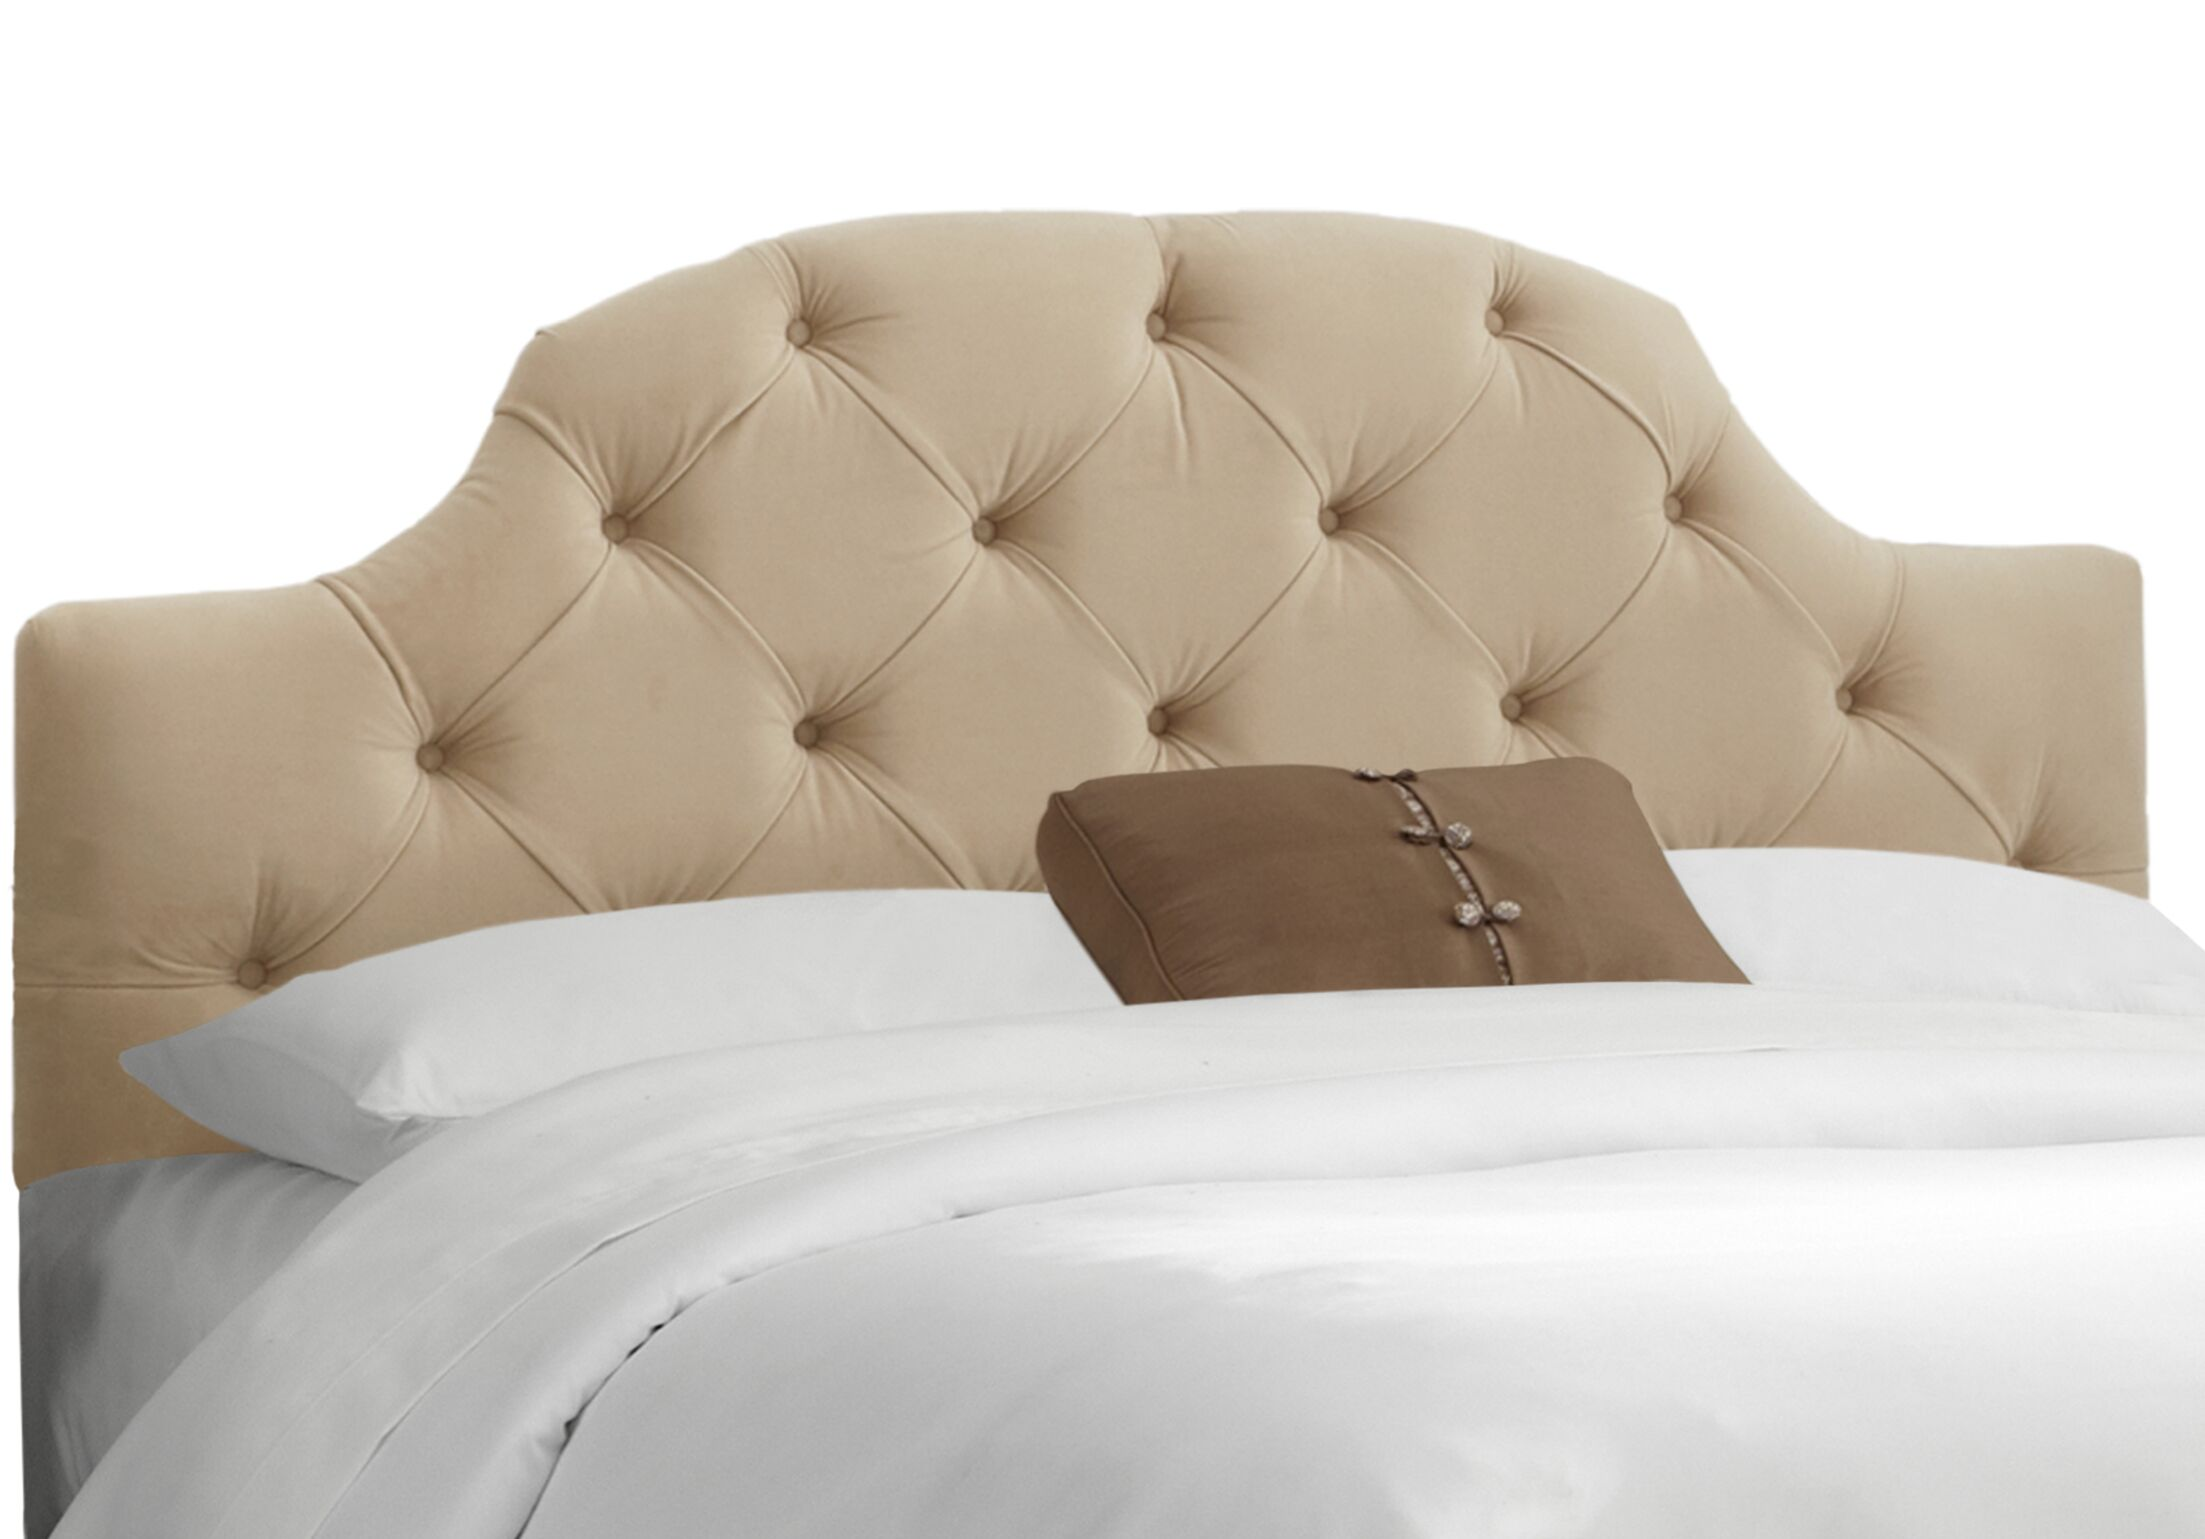 Doyon Tufted Upholstered Panel Headboard Upholstery: Premier Oatmeal, Size: California King